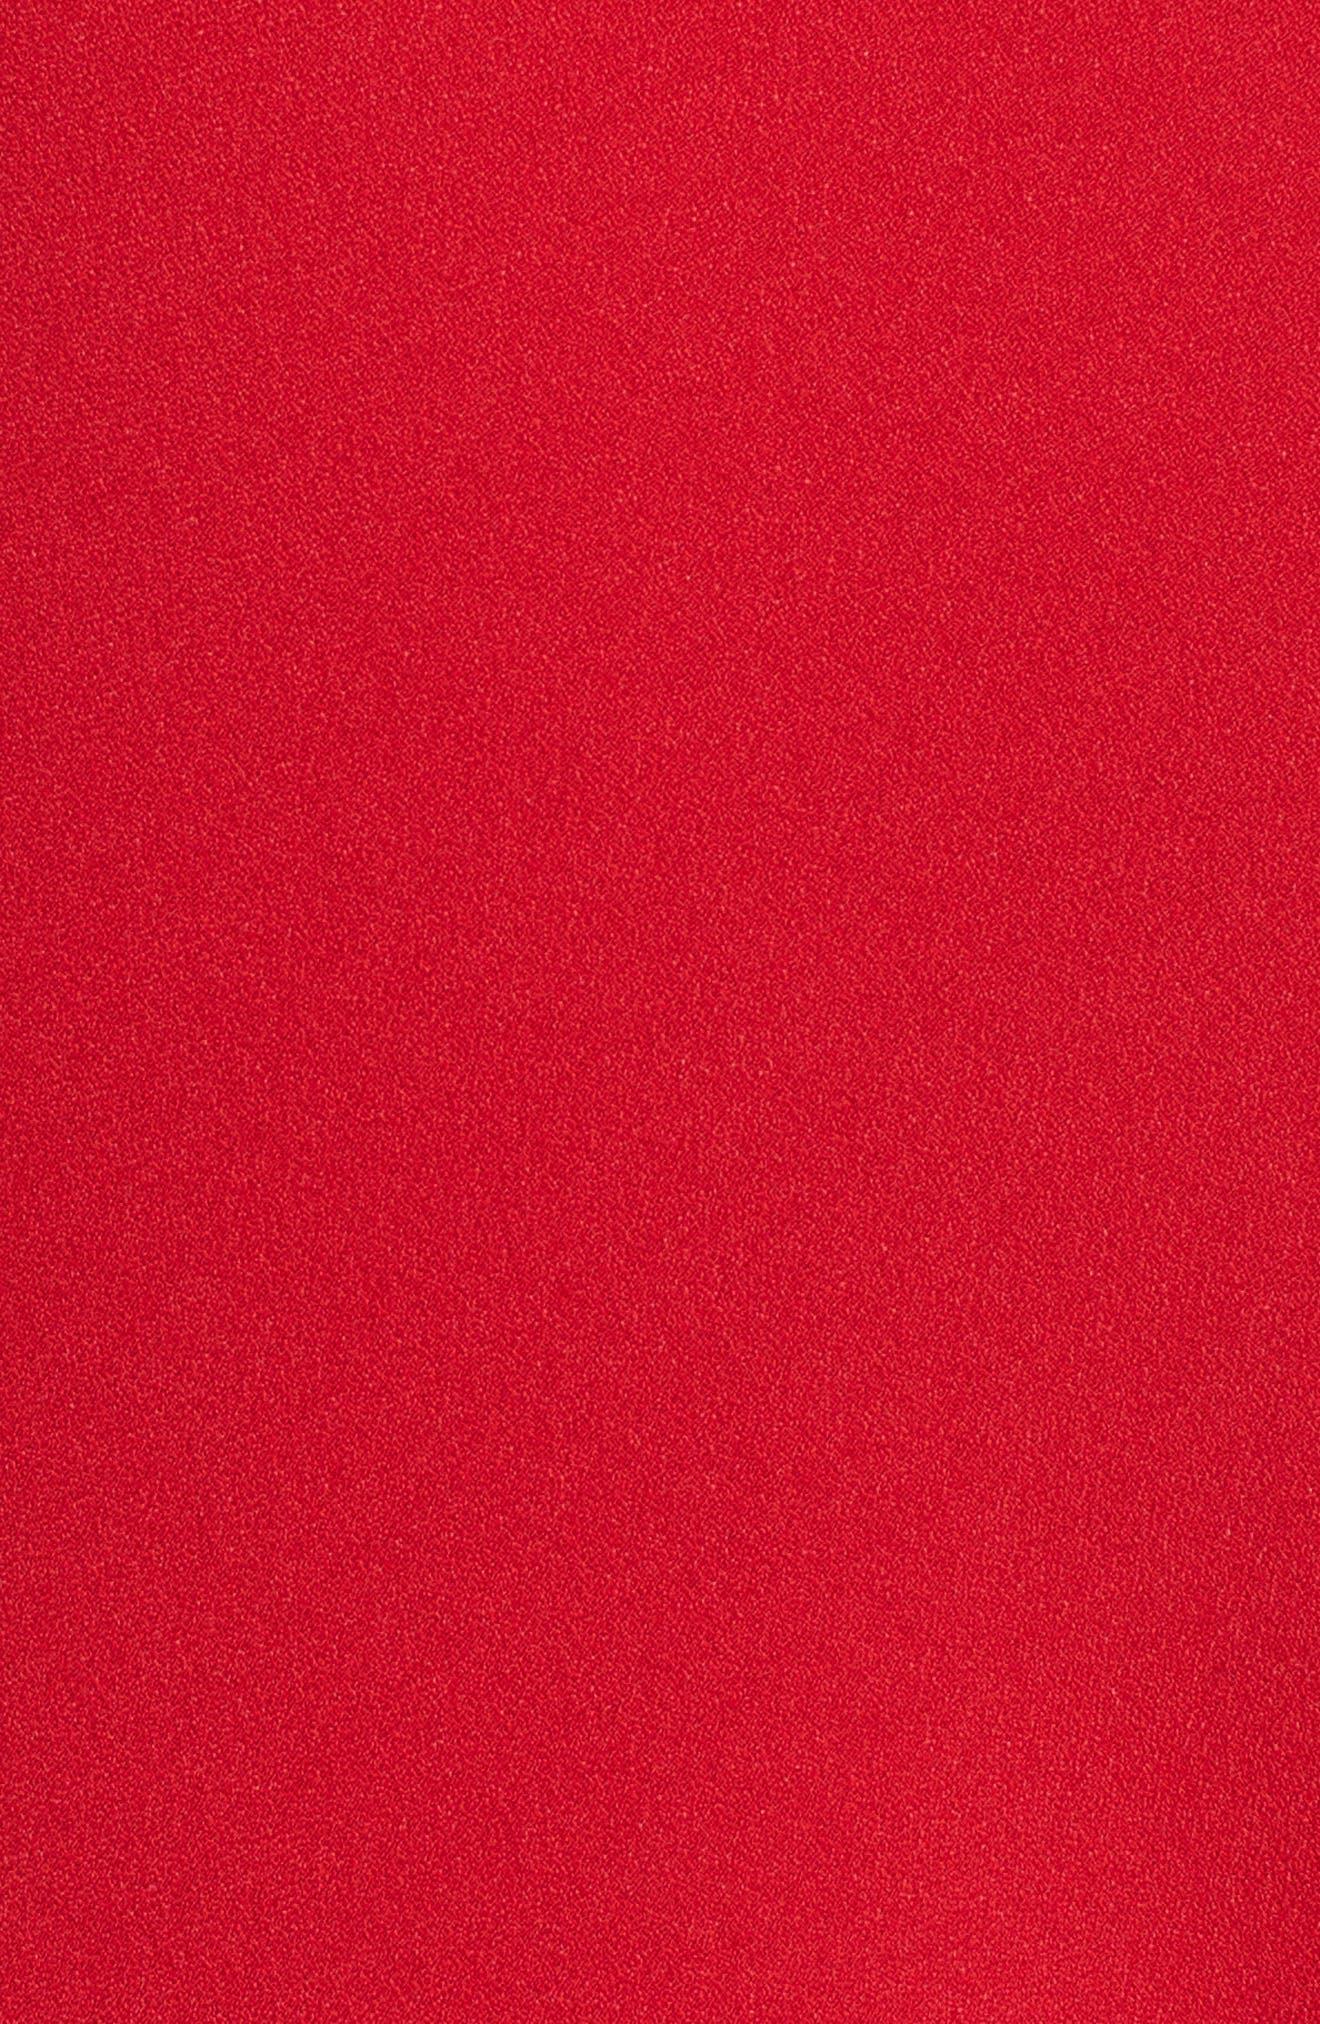 Alternate Image 3  - Victoria Beckham Satin Crepe Godet Skirt